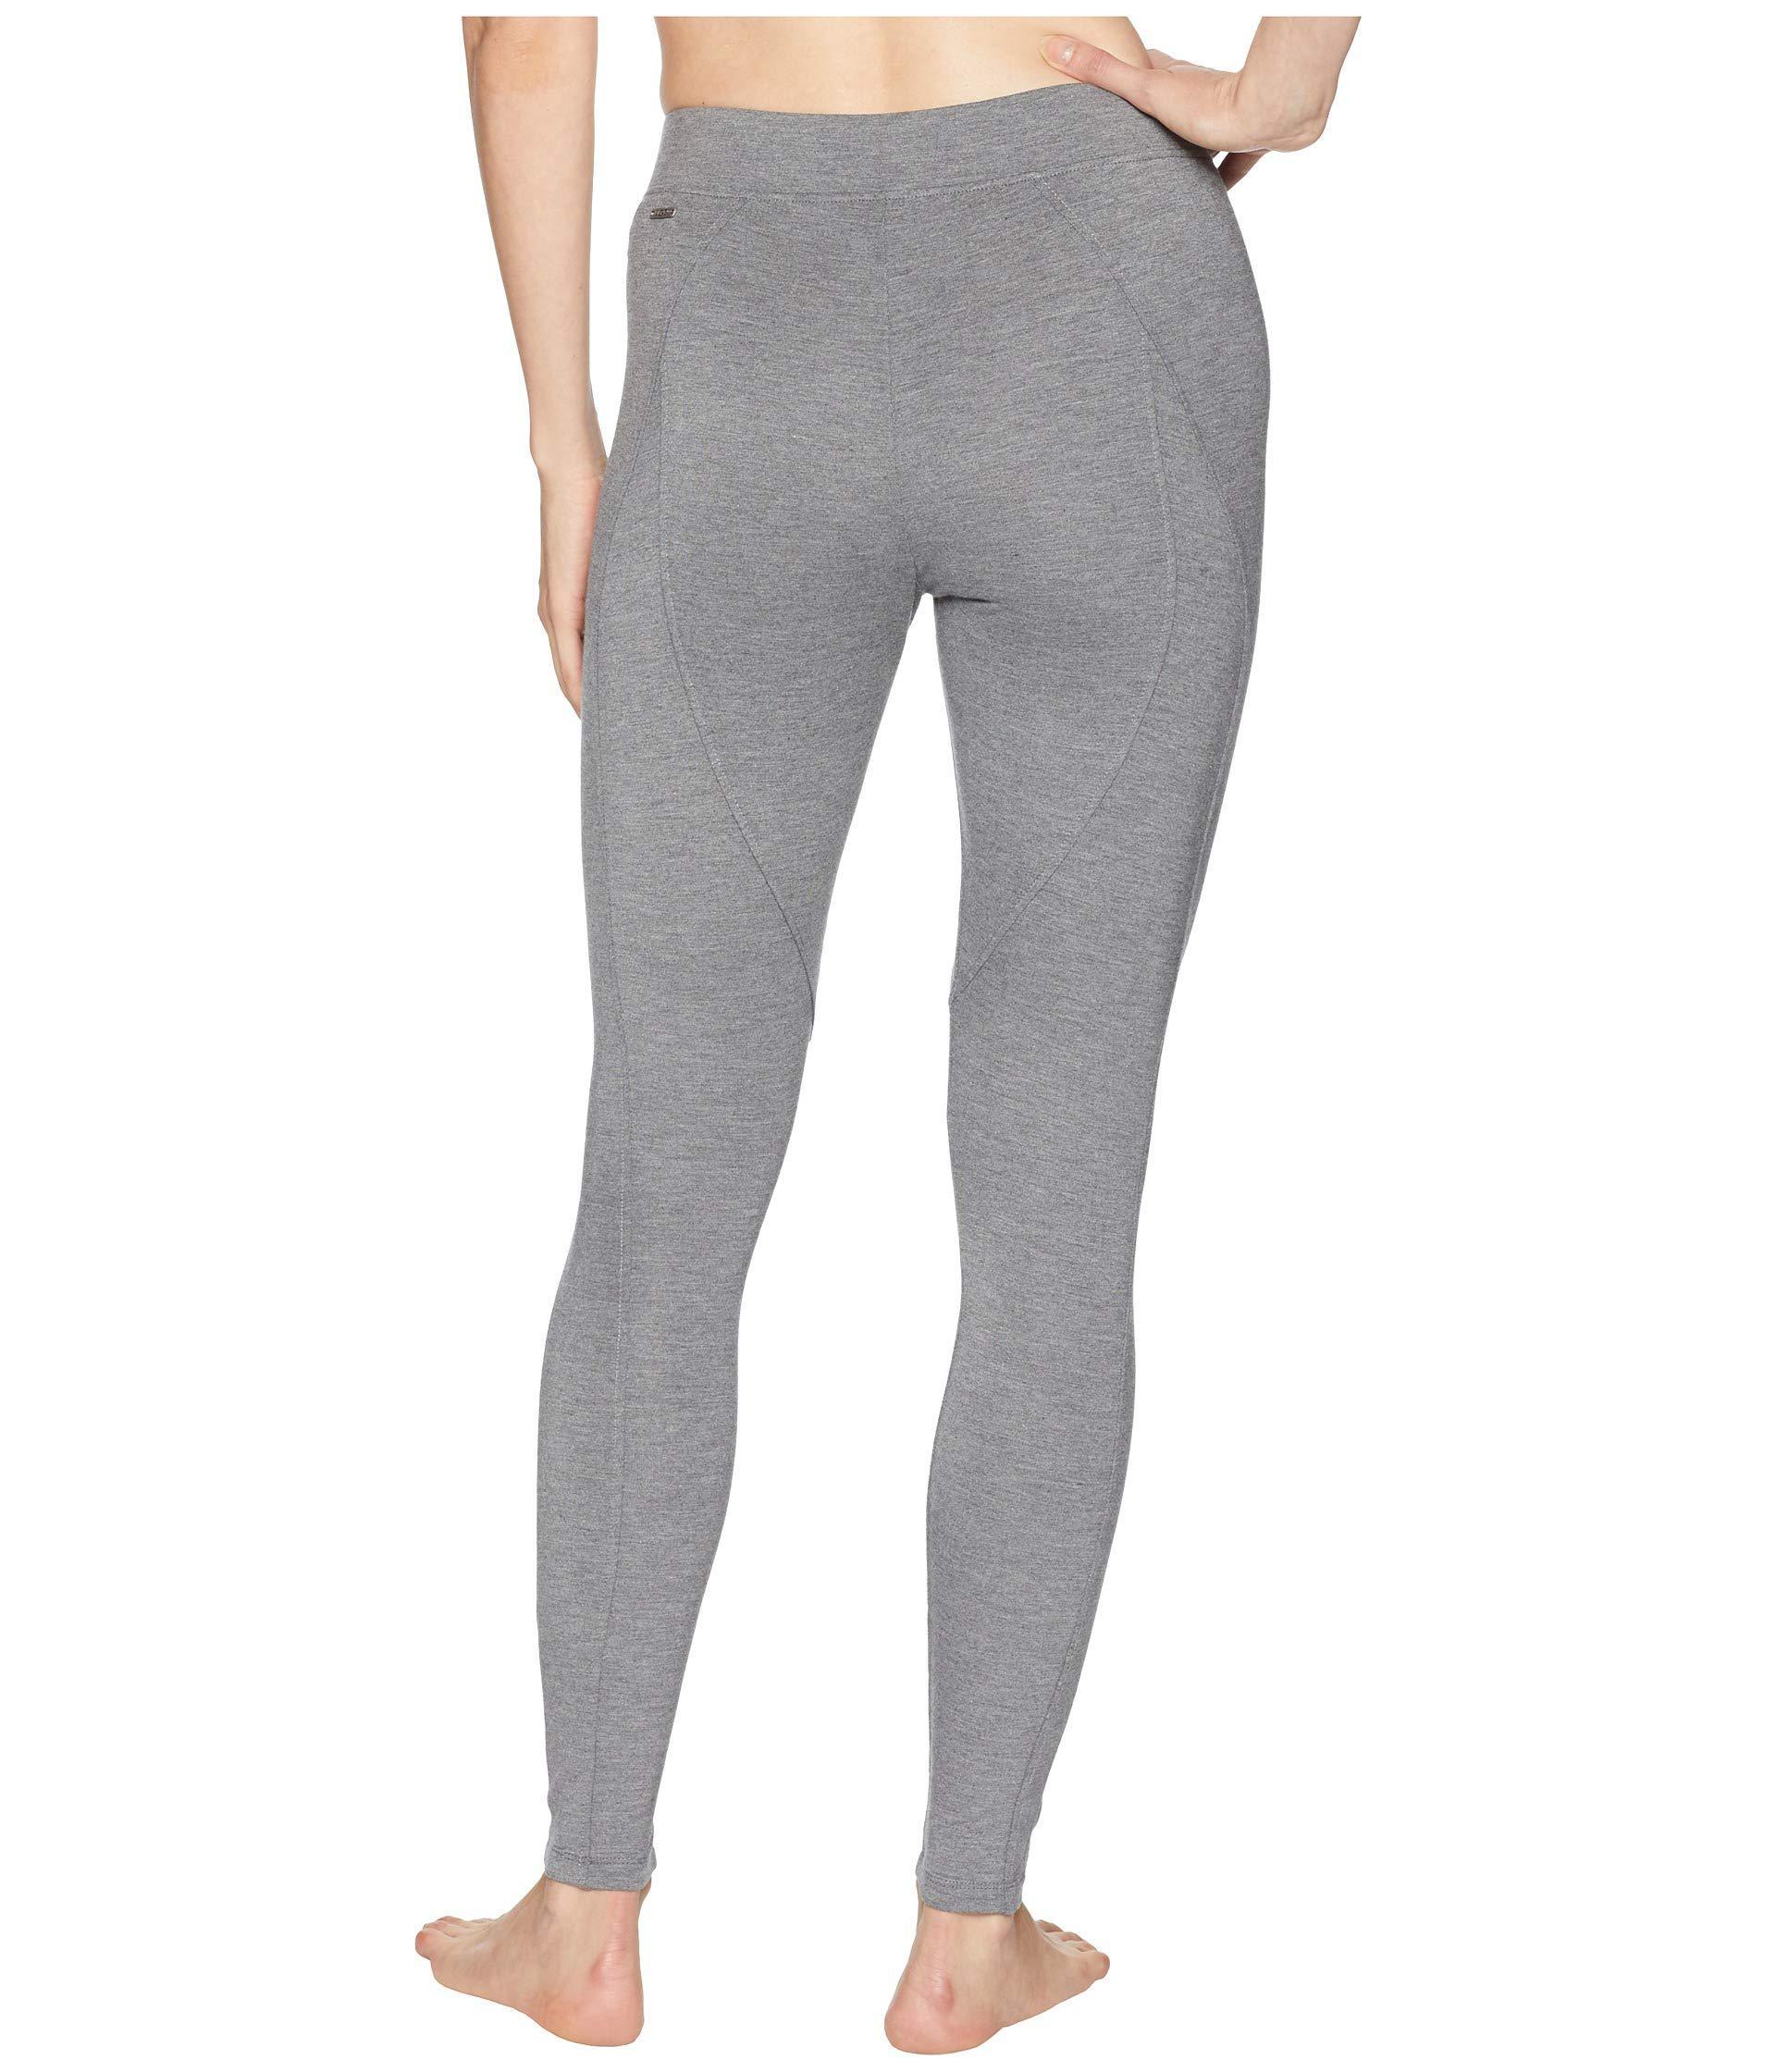 da968458787 Lyst - UGG Watts Paneled Leggings (black) Women's Casual Pants in Gray